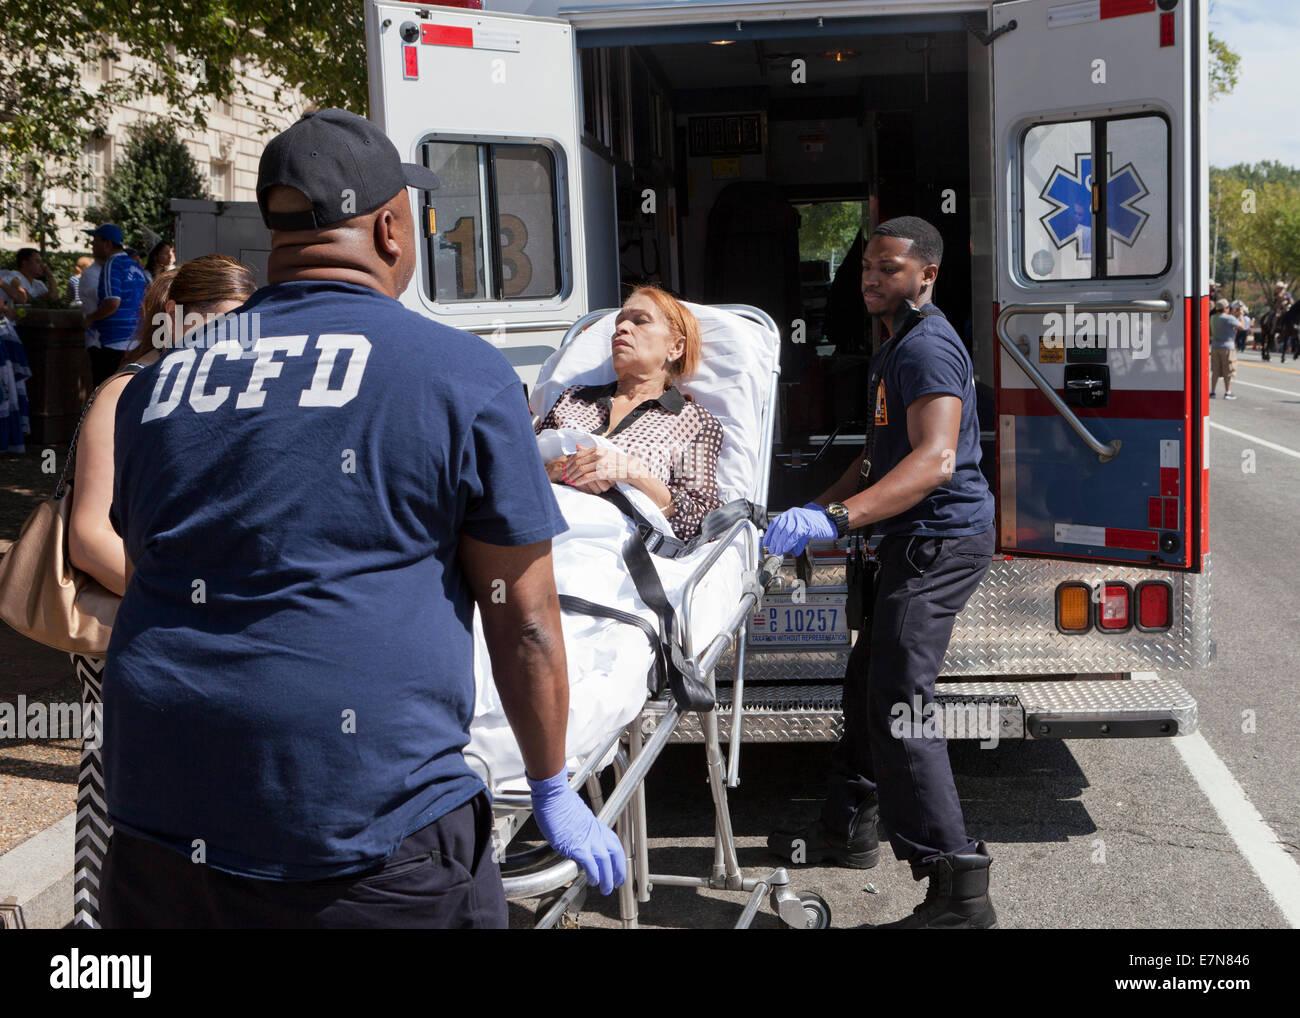 DCFD EMT loading patient into ambulance - Washington, DC USA Stock Photo